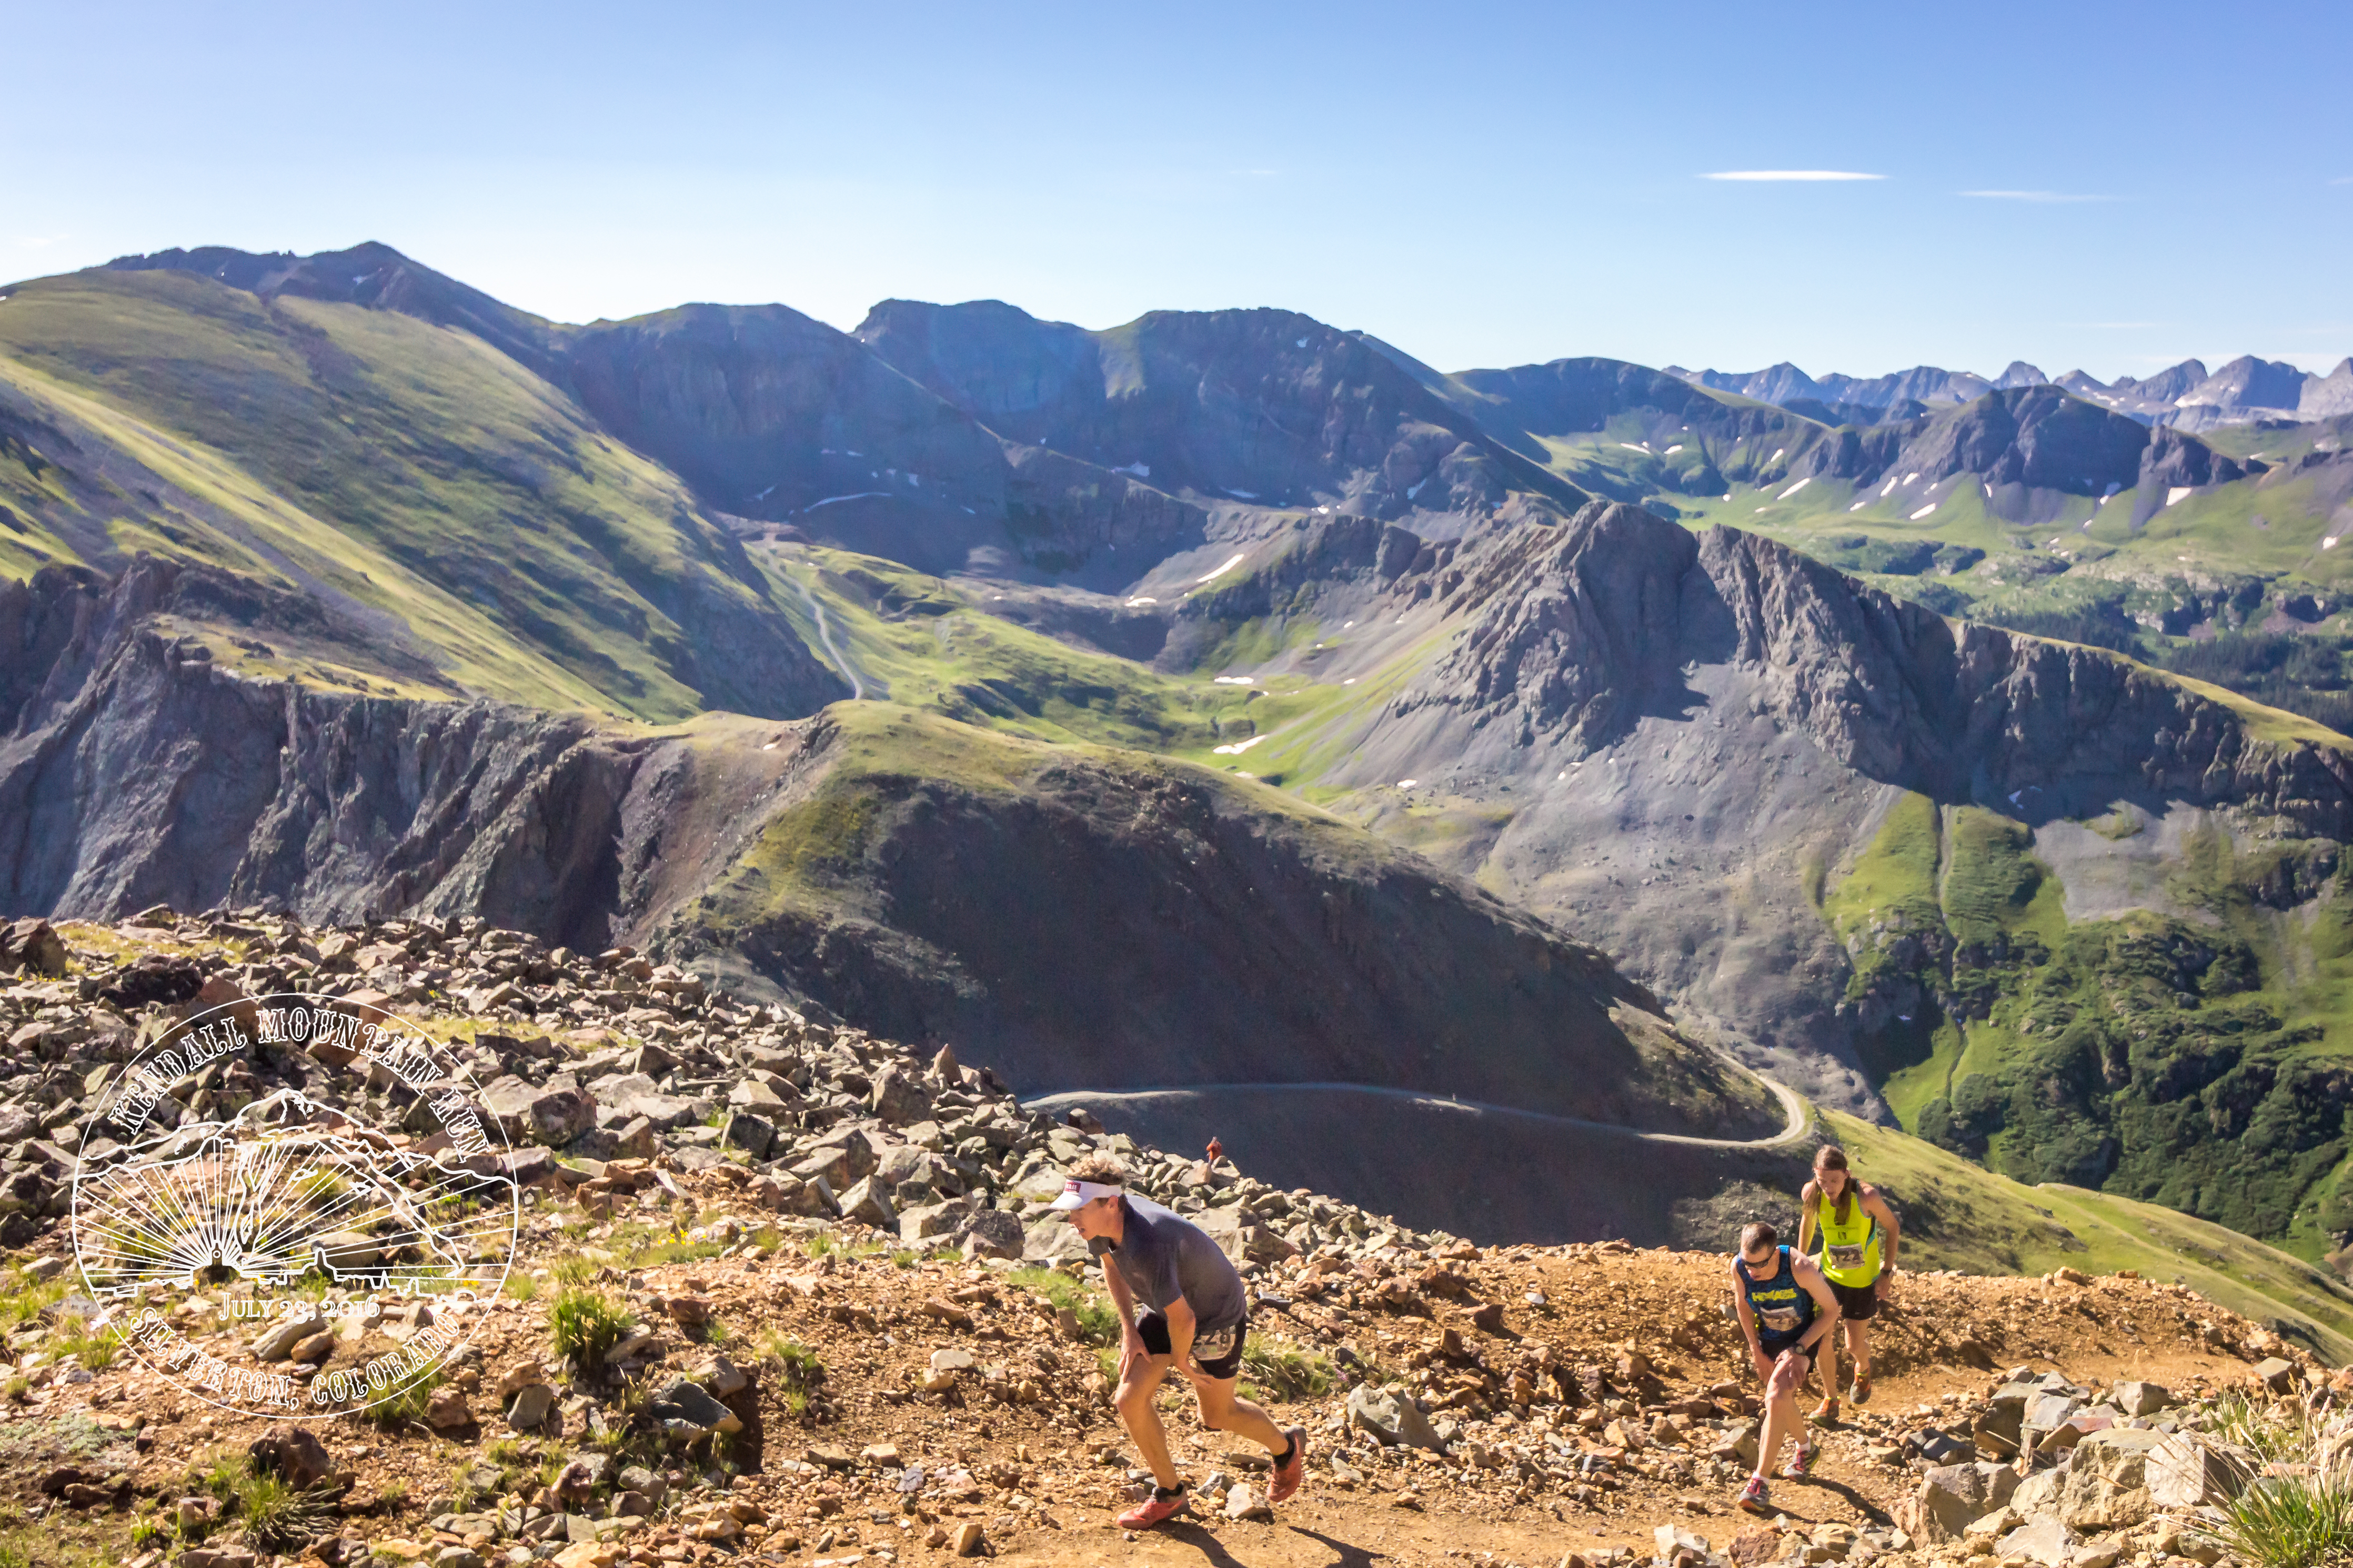 Dakota Jones, Timmy Parr, & Tate Lagasca at the 2016 Kendall Mountain Run